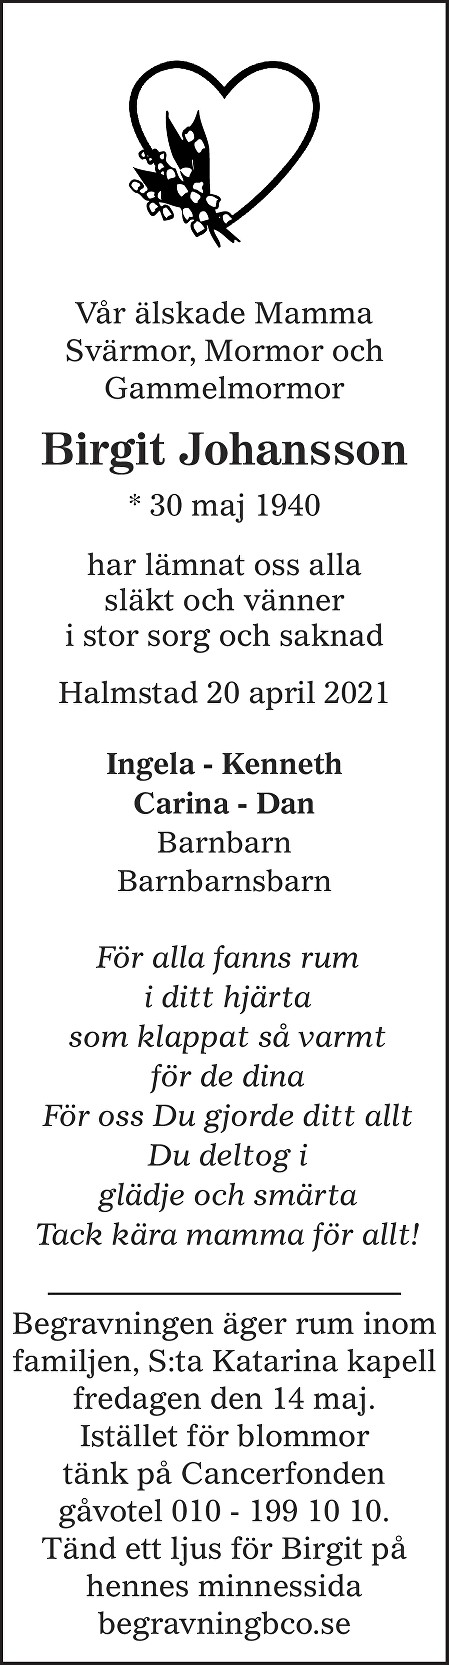 Birgit Johansson Death notice